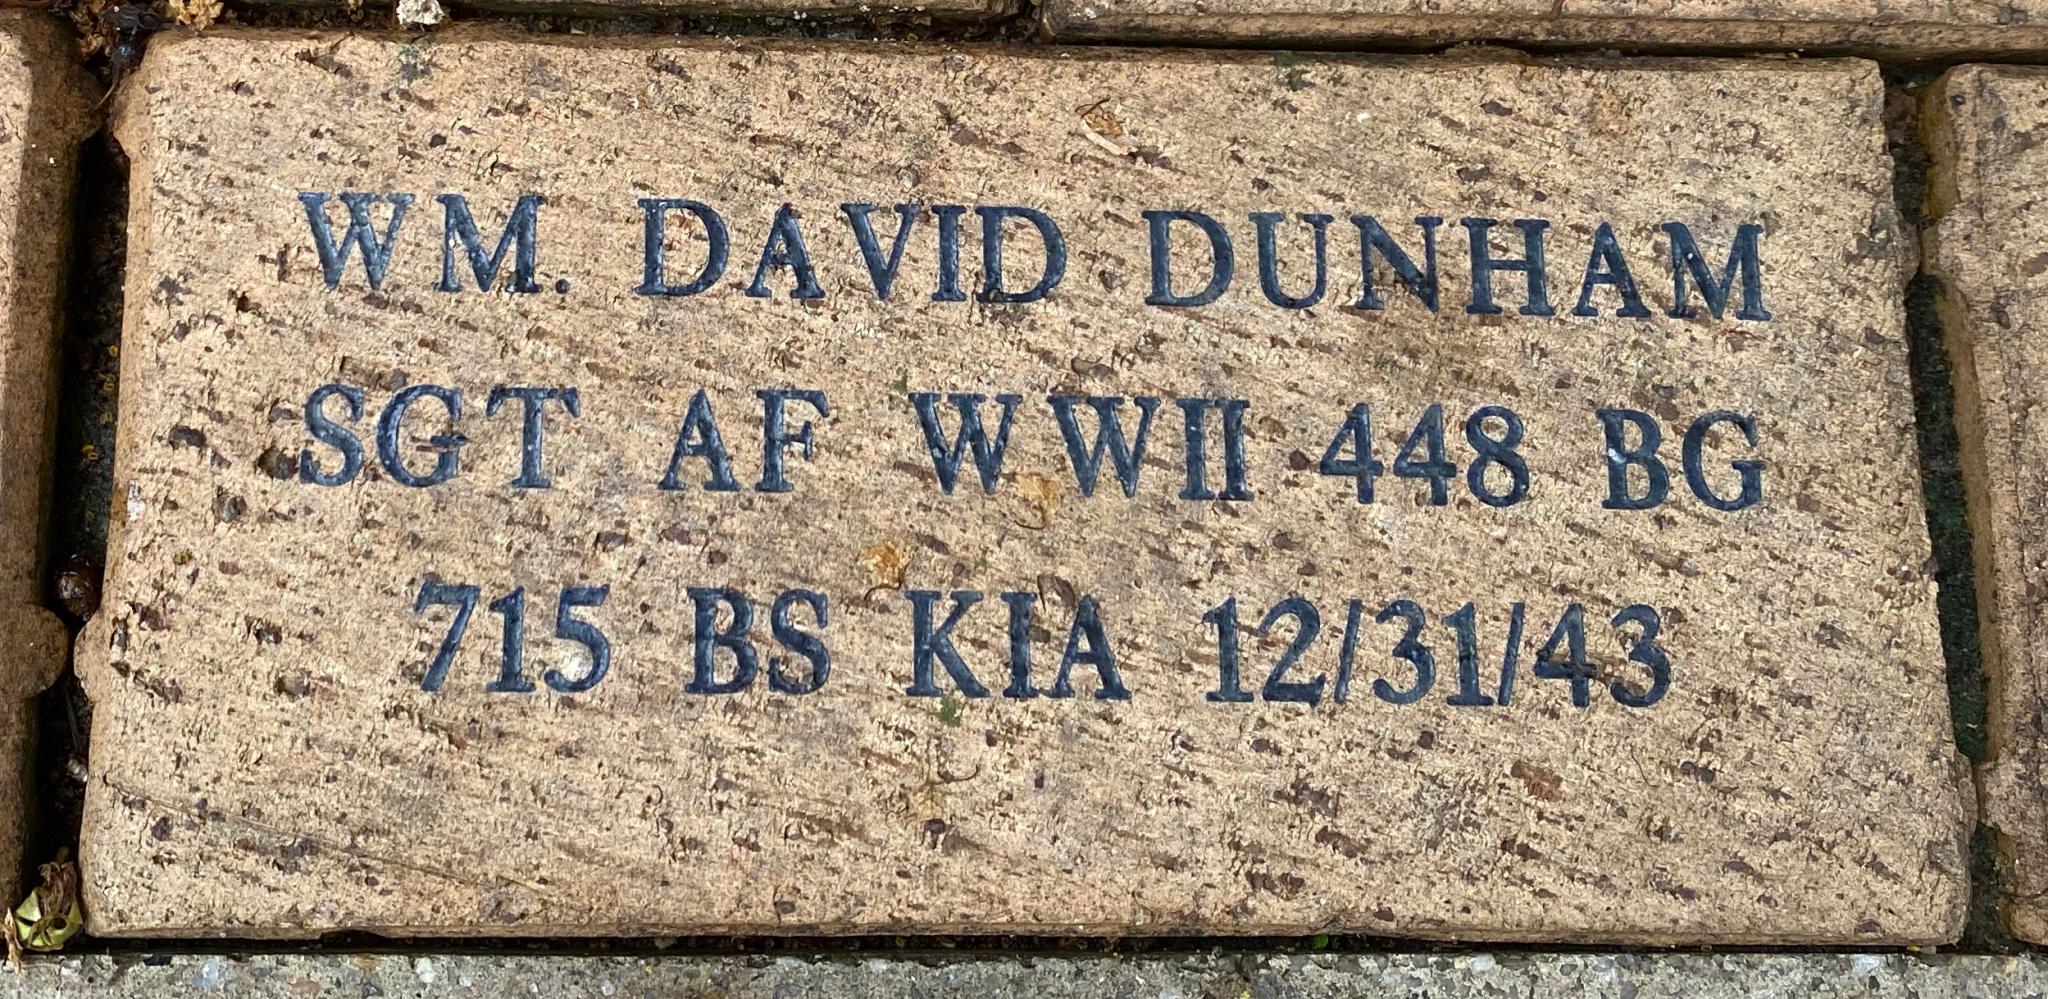 WM. DAVID DUNHAM SGT AF WWII 448 BG 715 BS KIA 12/31/43